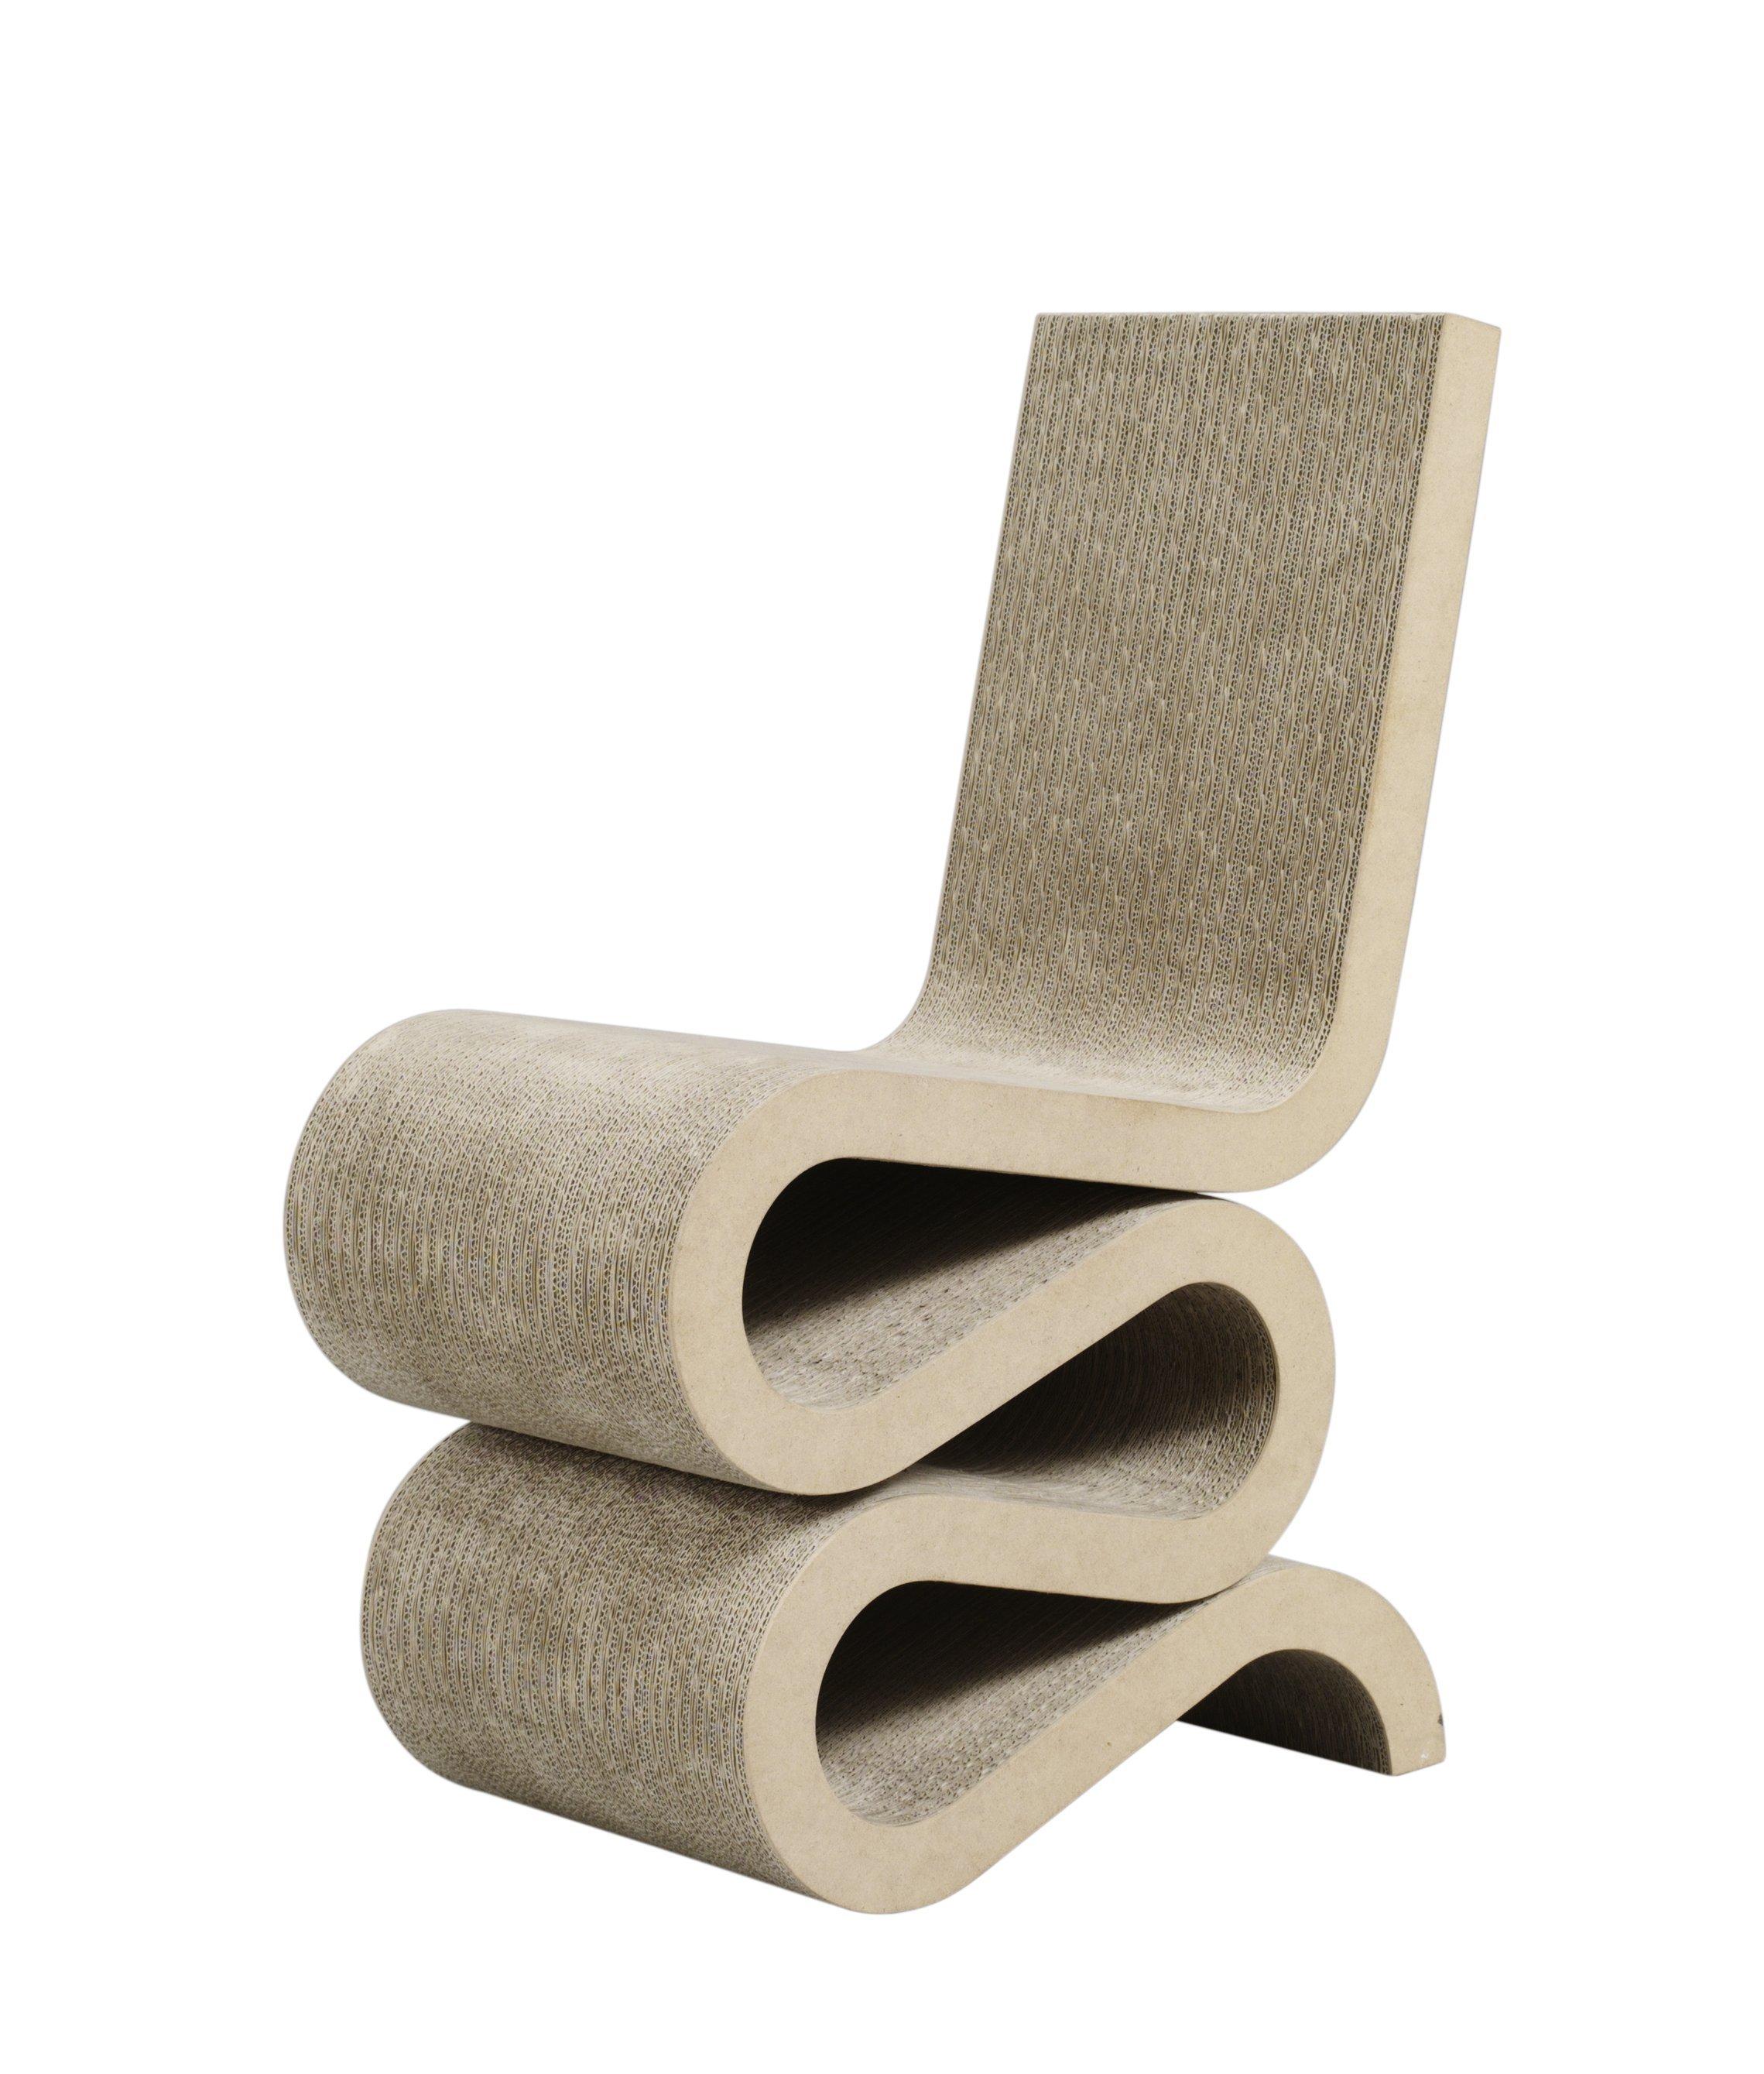 Frank Gehry Wiggle Chair  Rigakublogcom